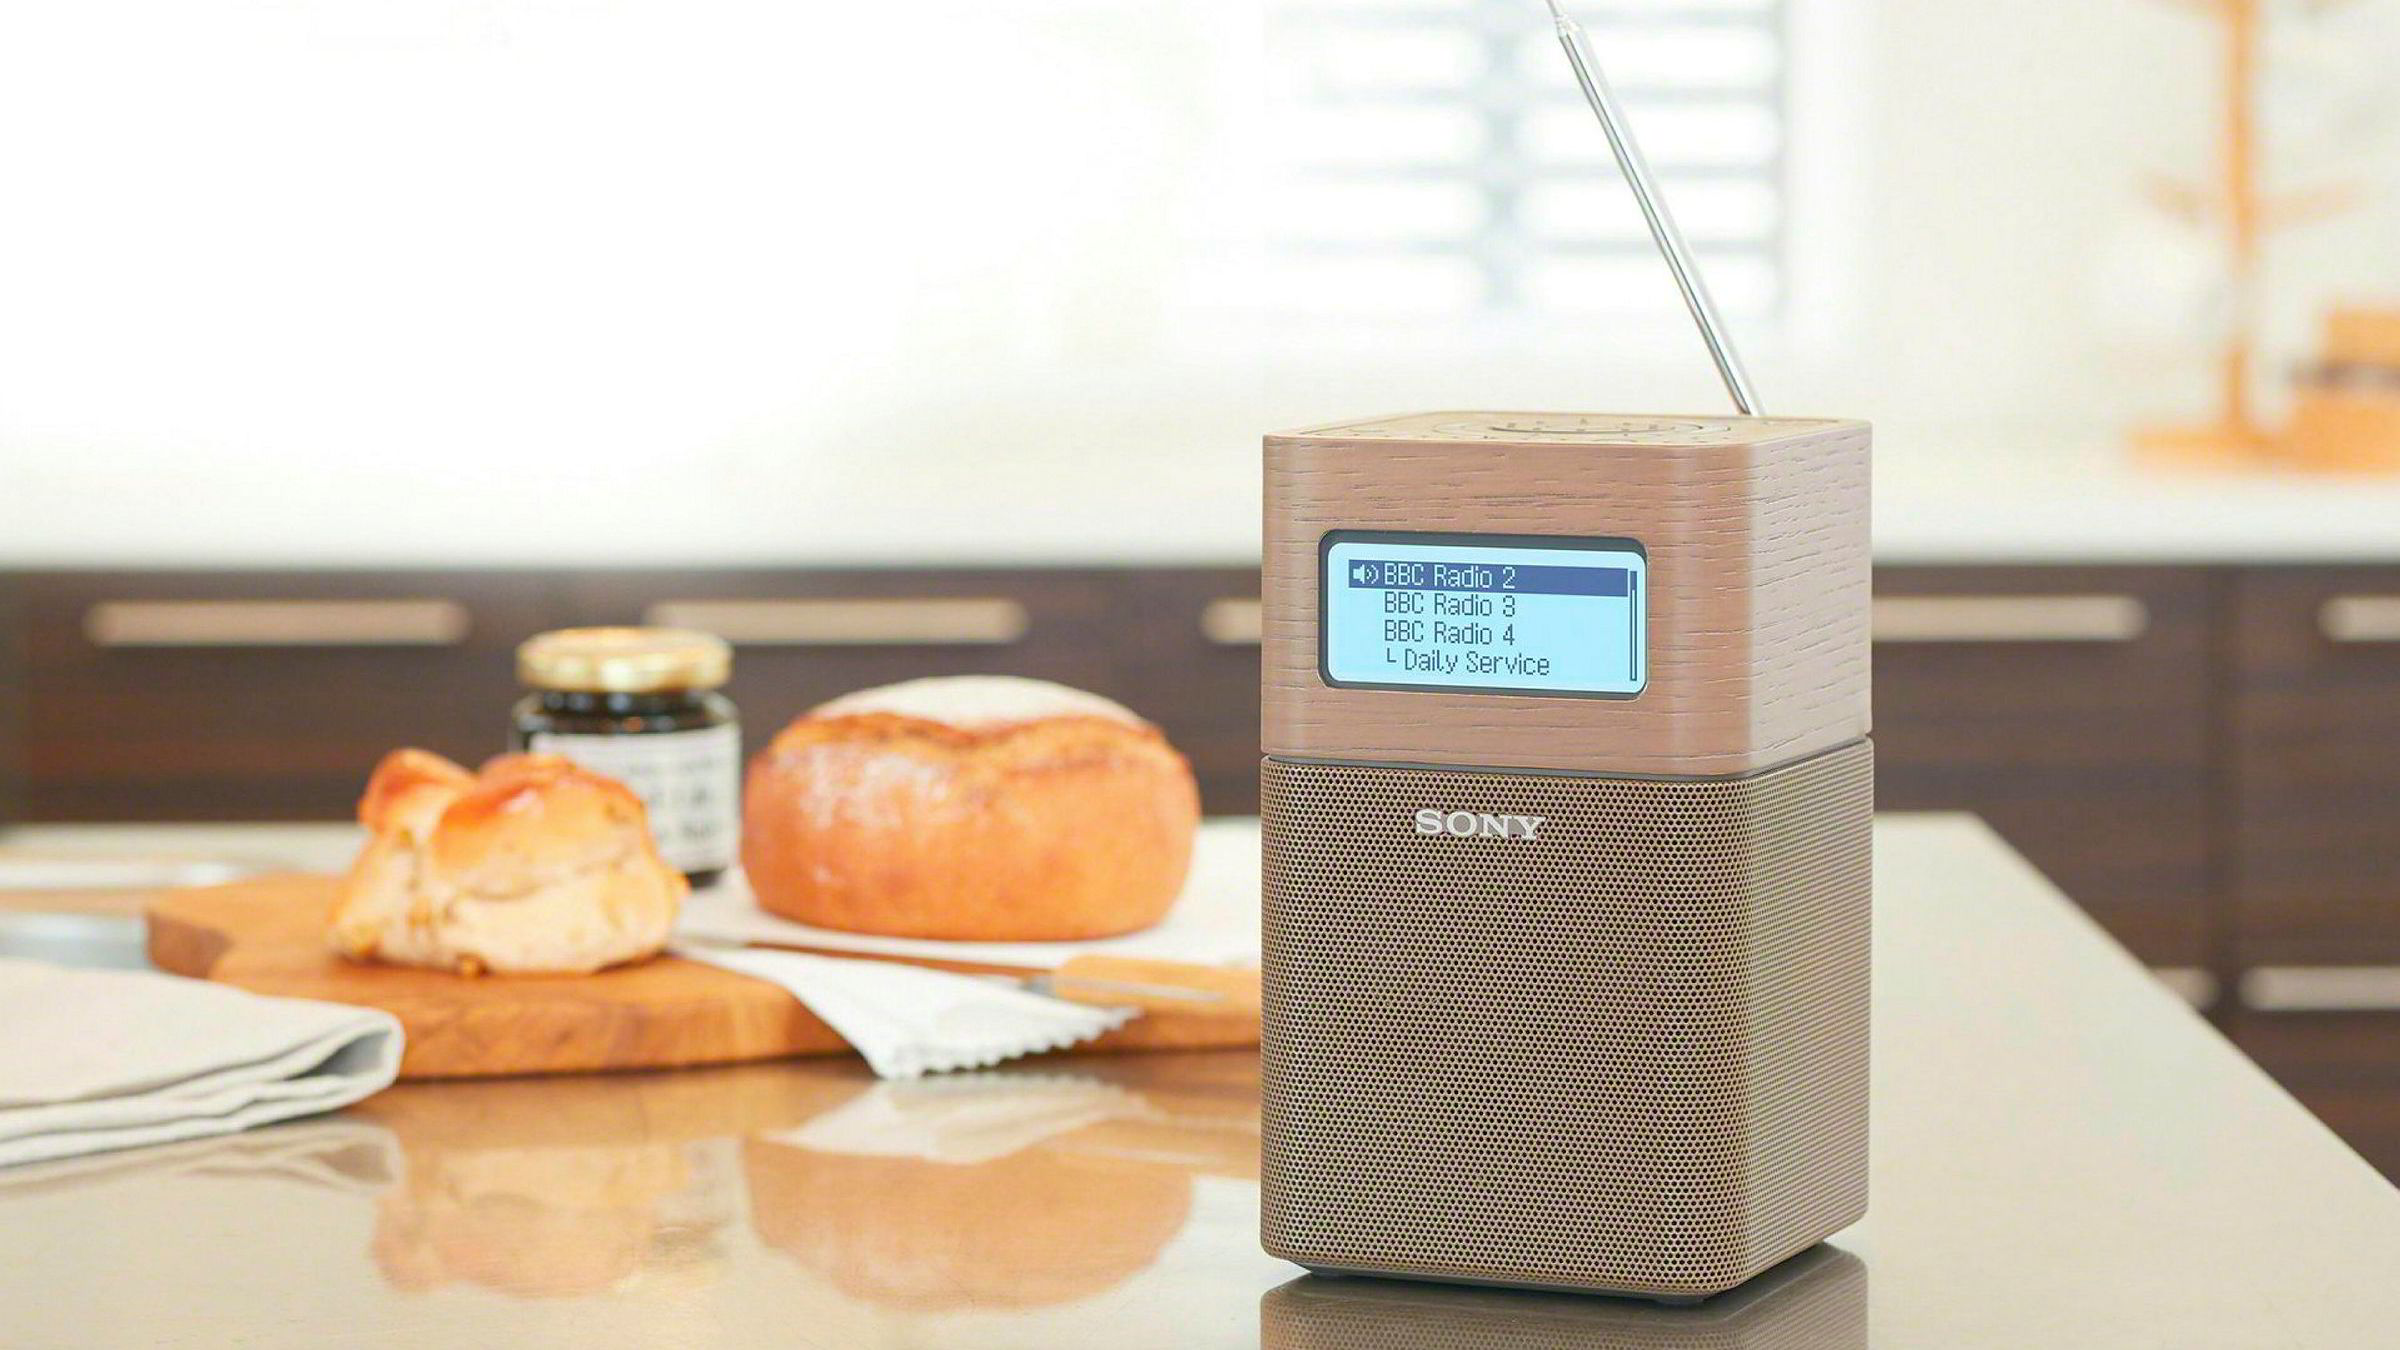 cc707fa55 Test av 8 DAB-radioer | DN